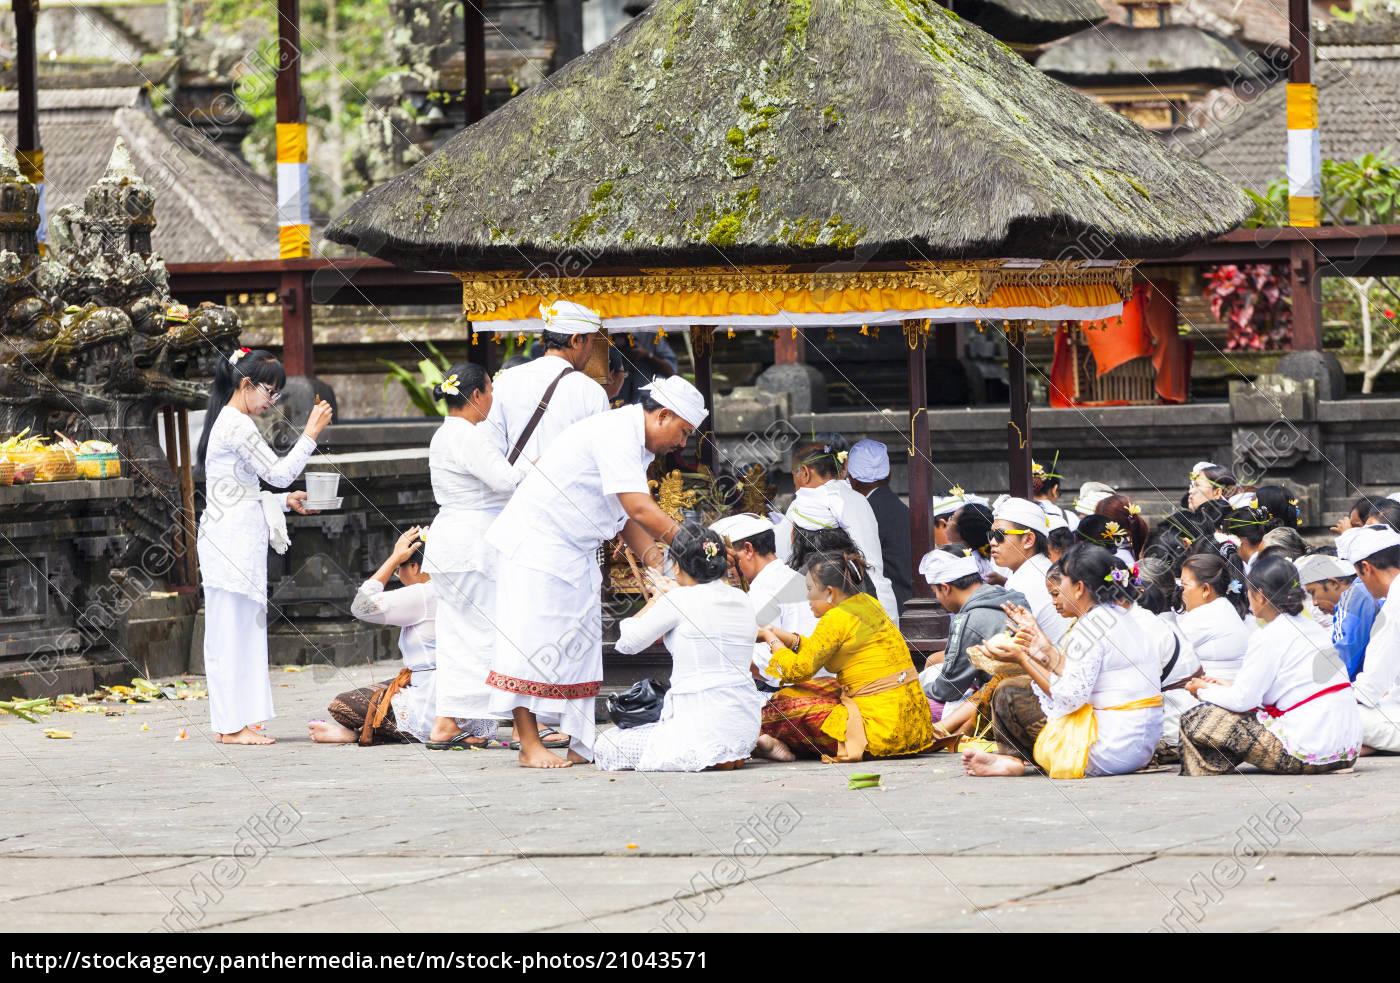 indonesien, leute, die, an, pura, penataran, agung-tempel, sitzen - 21043571